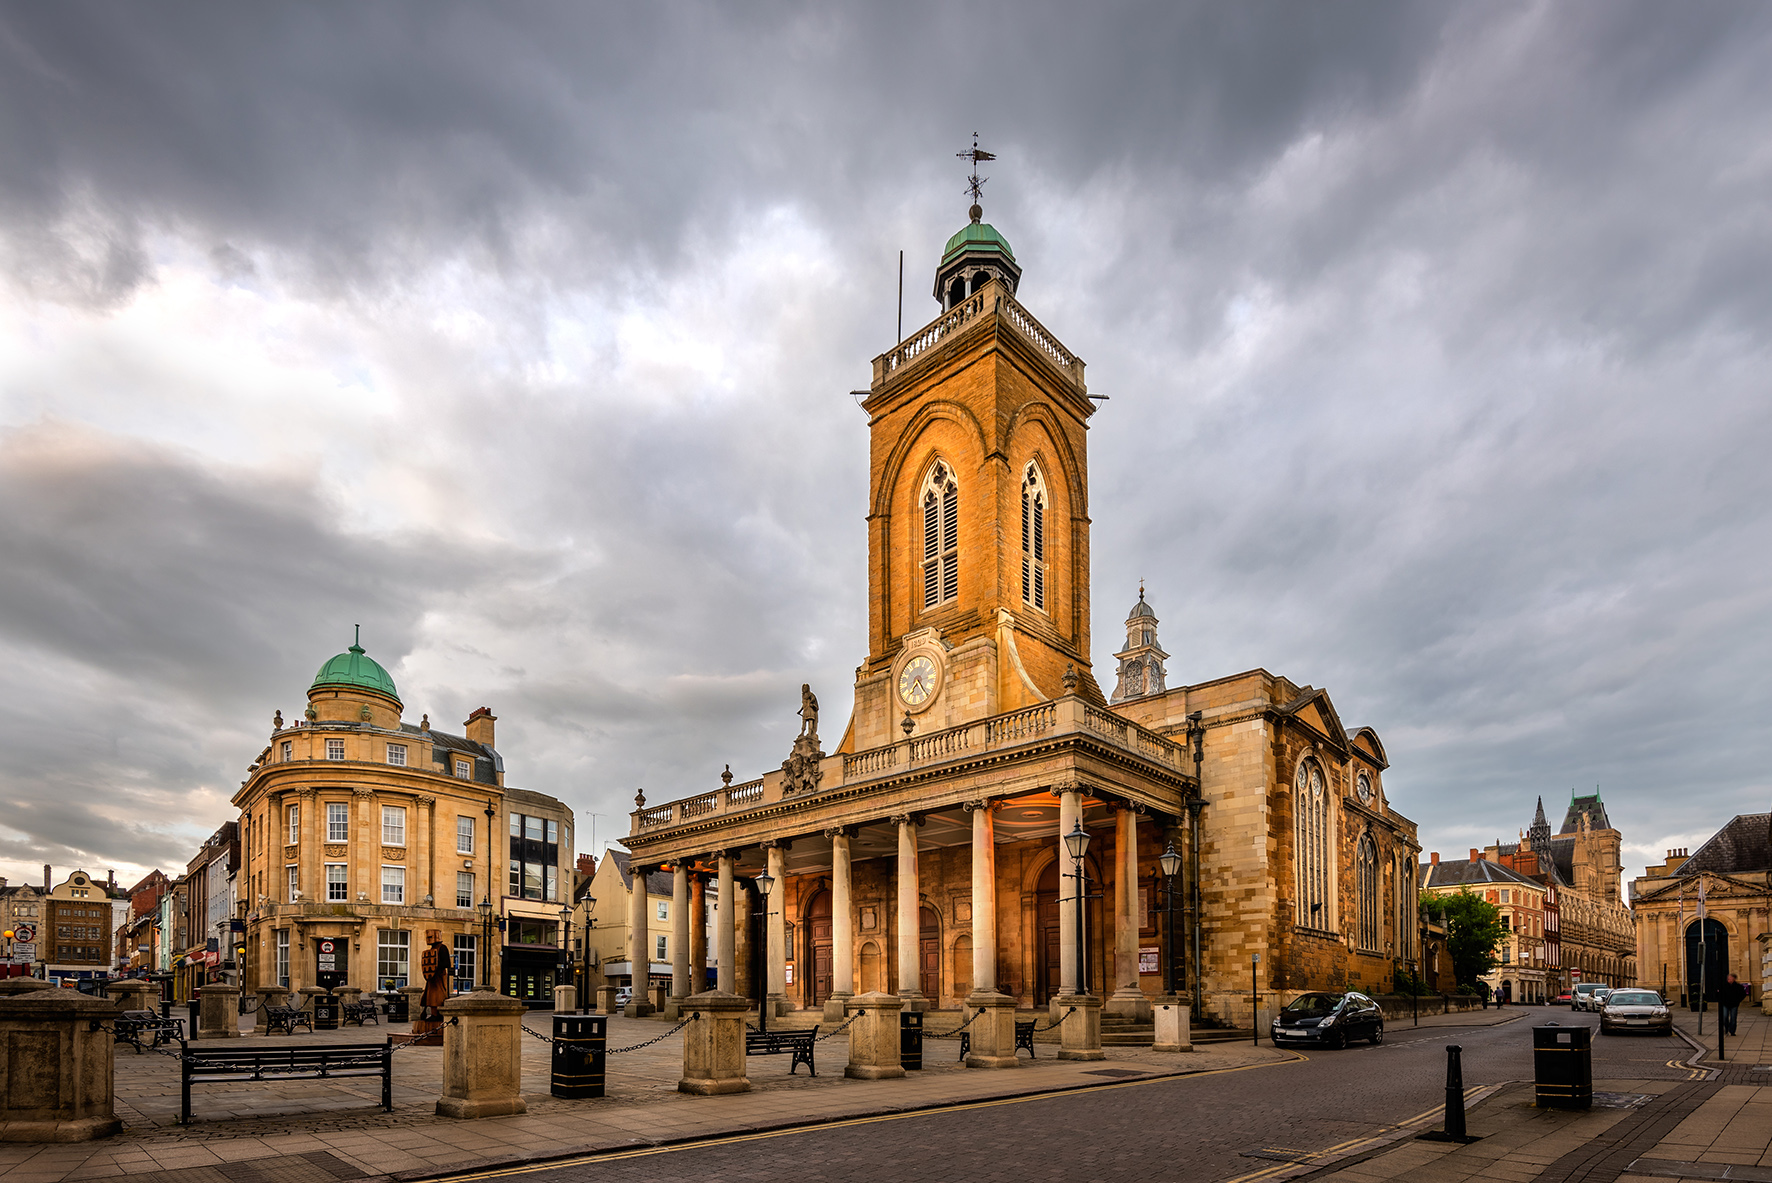 Northampton city